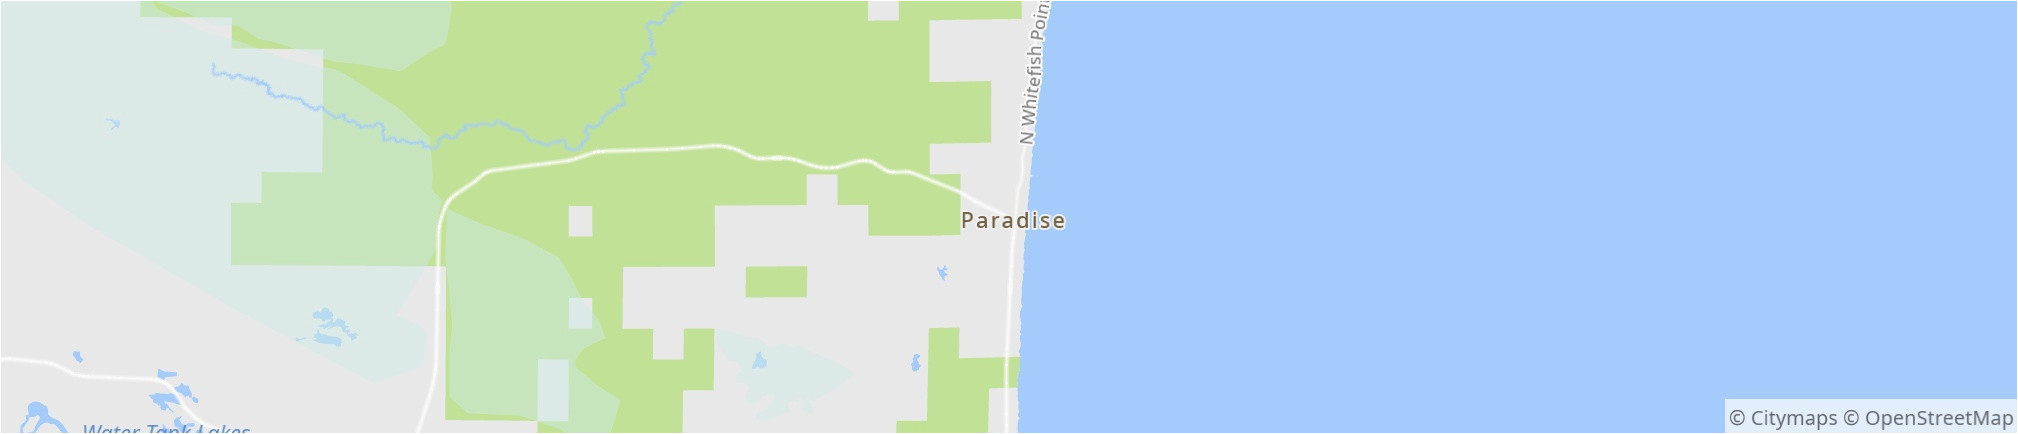 paradise 2019 best of paradise mi tourism tripadvisor